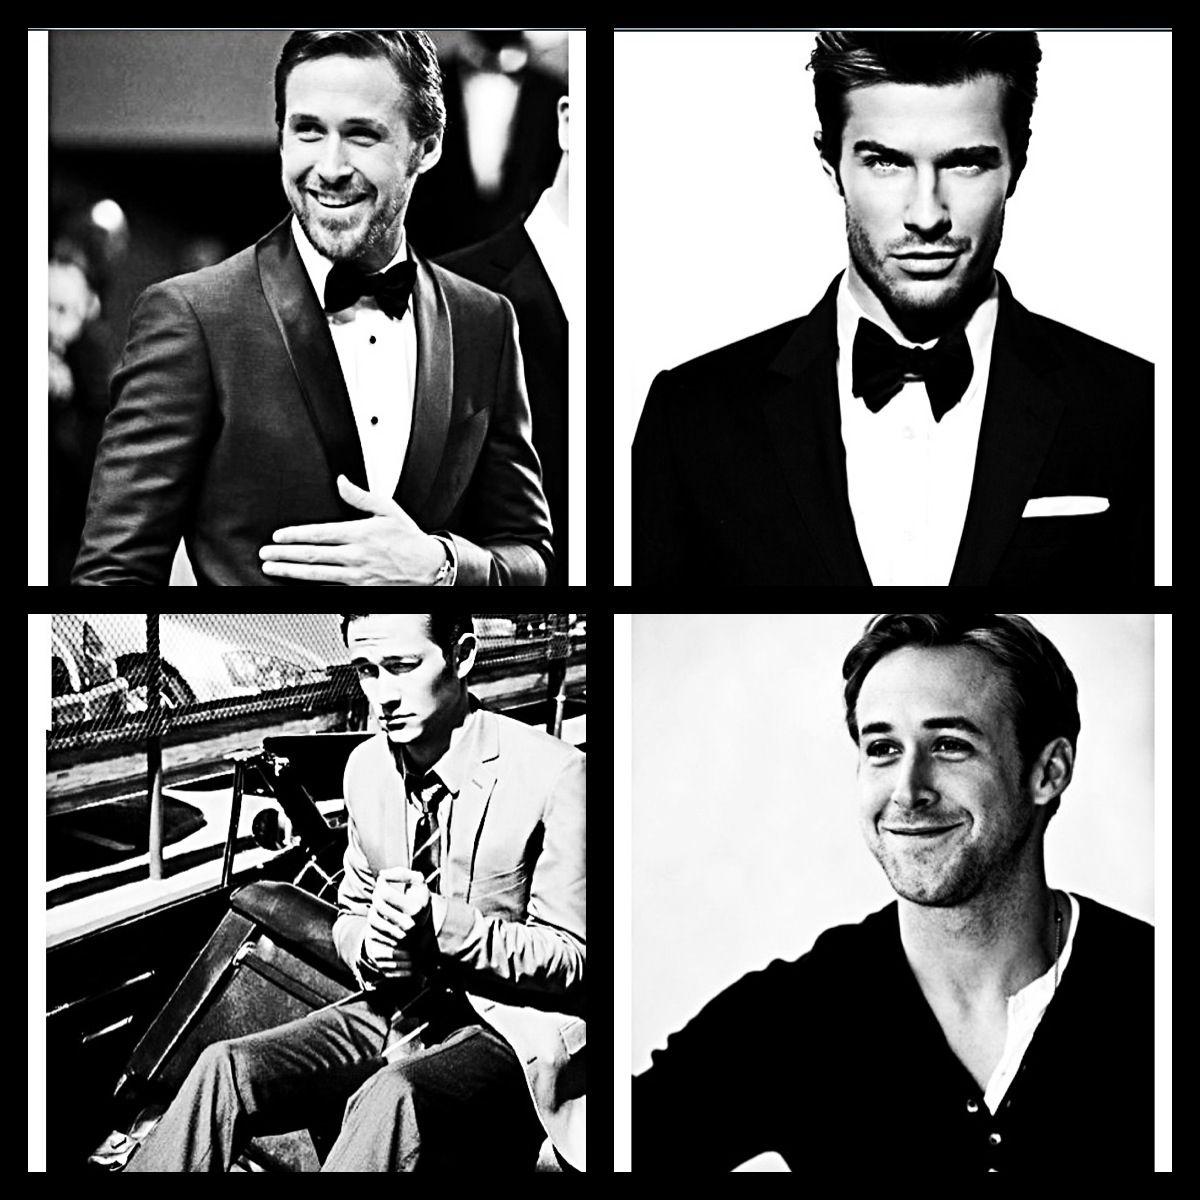 Ooo how men are so cute:)!